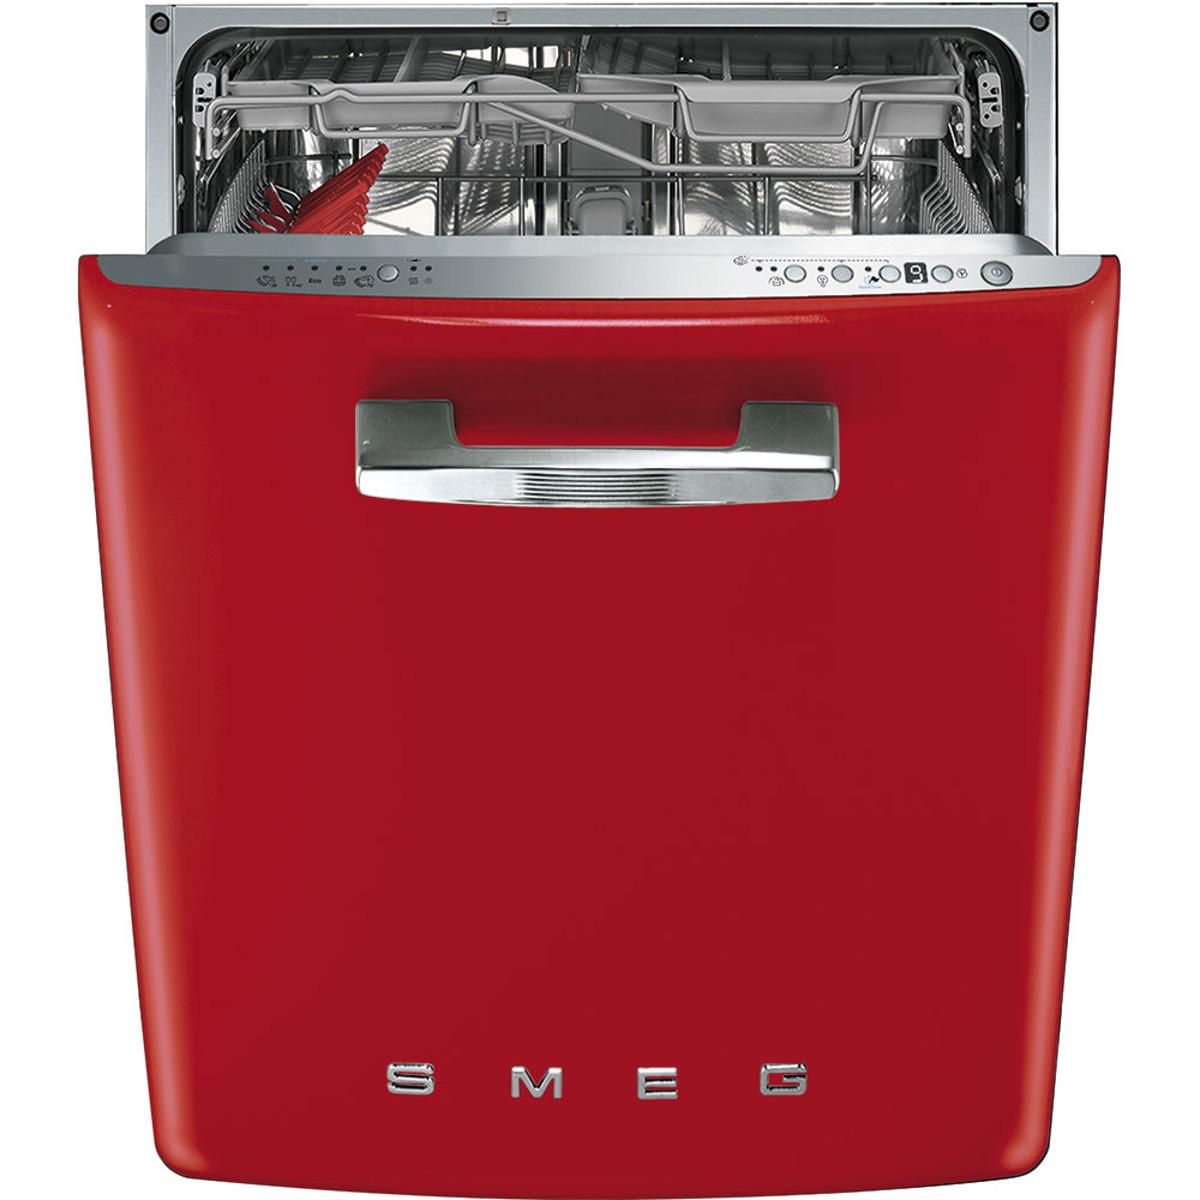 Smeg DI6FABRD Integrated 50's Retro Dishwasher in Red